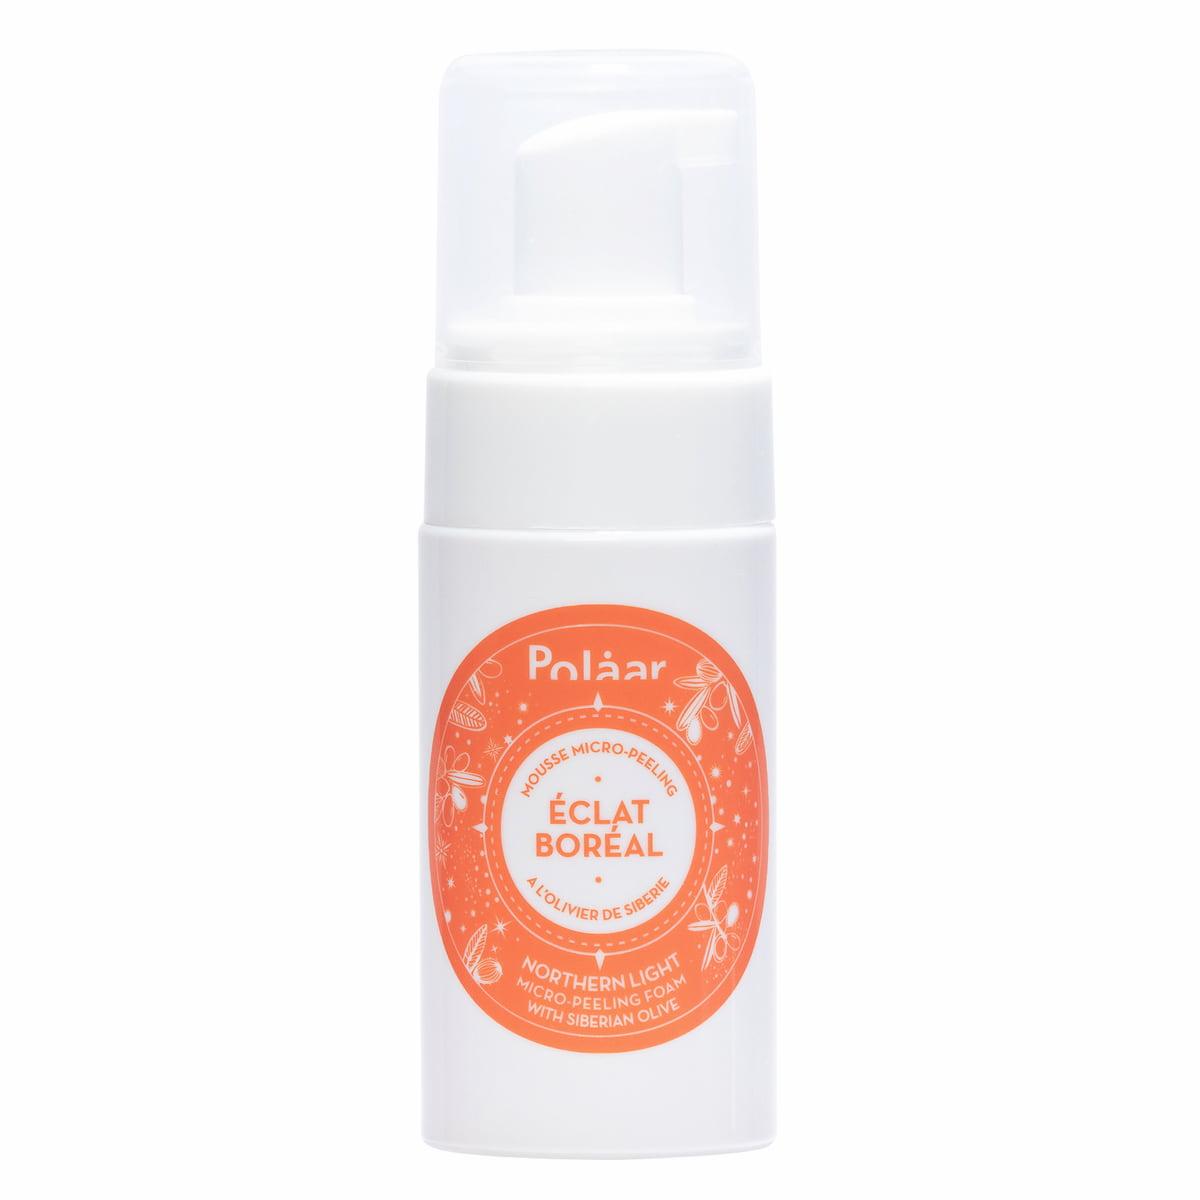 Polaar - Eclat Boréal - Mousse micro-peeling